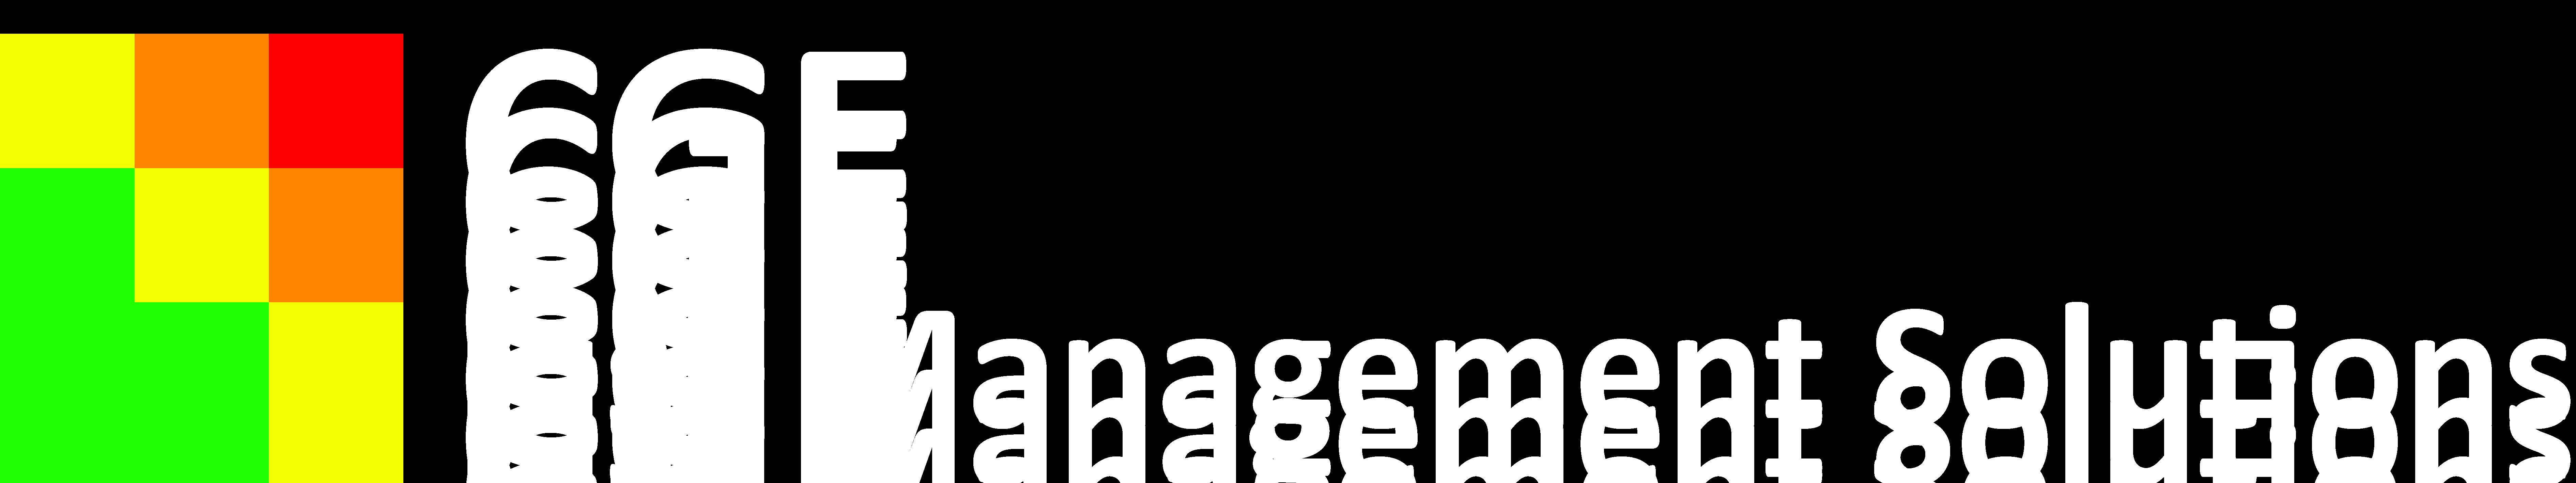 CGE Risk Management Solutions [tagline]